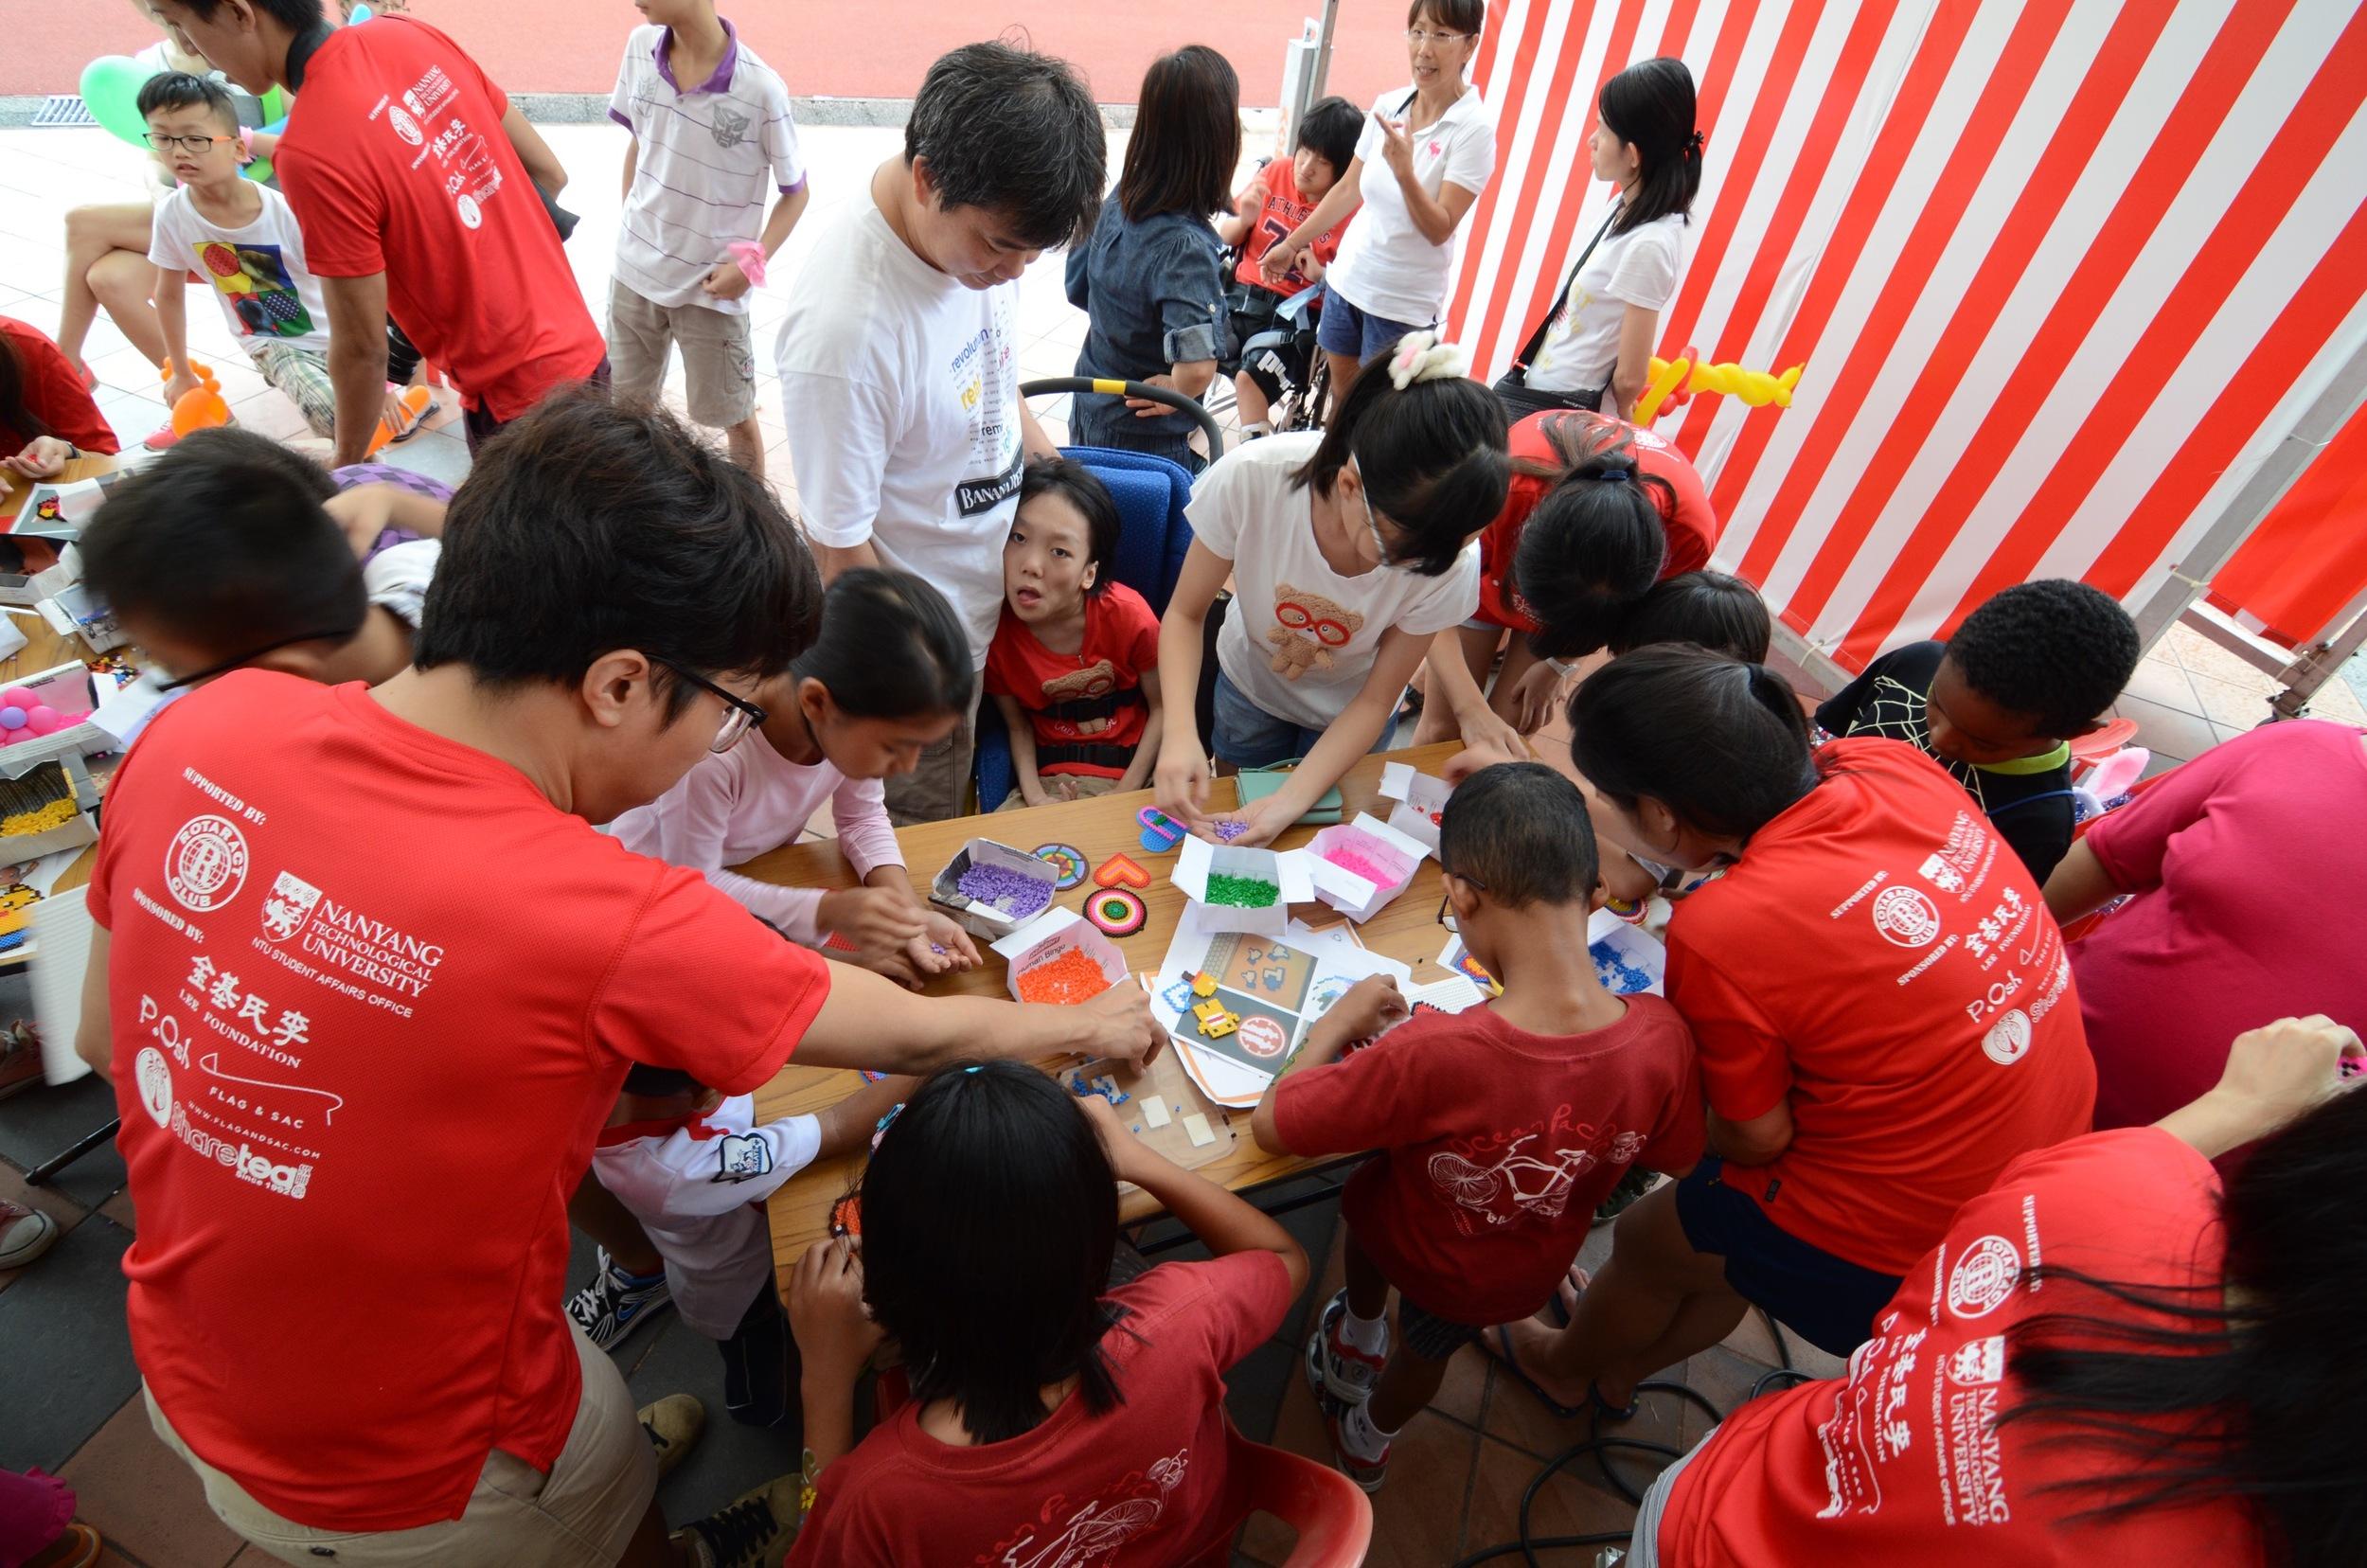 Club Rainbow Singapore Annual Party 2014 -9.JPG